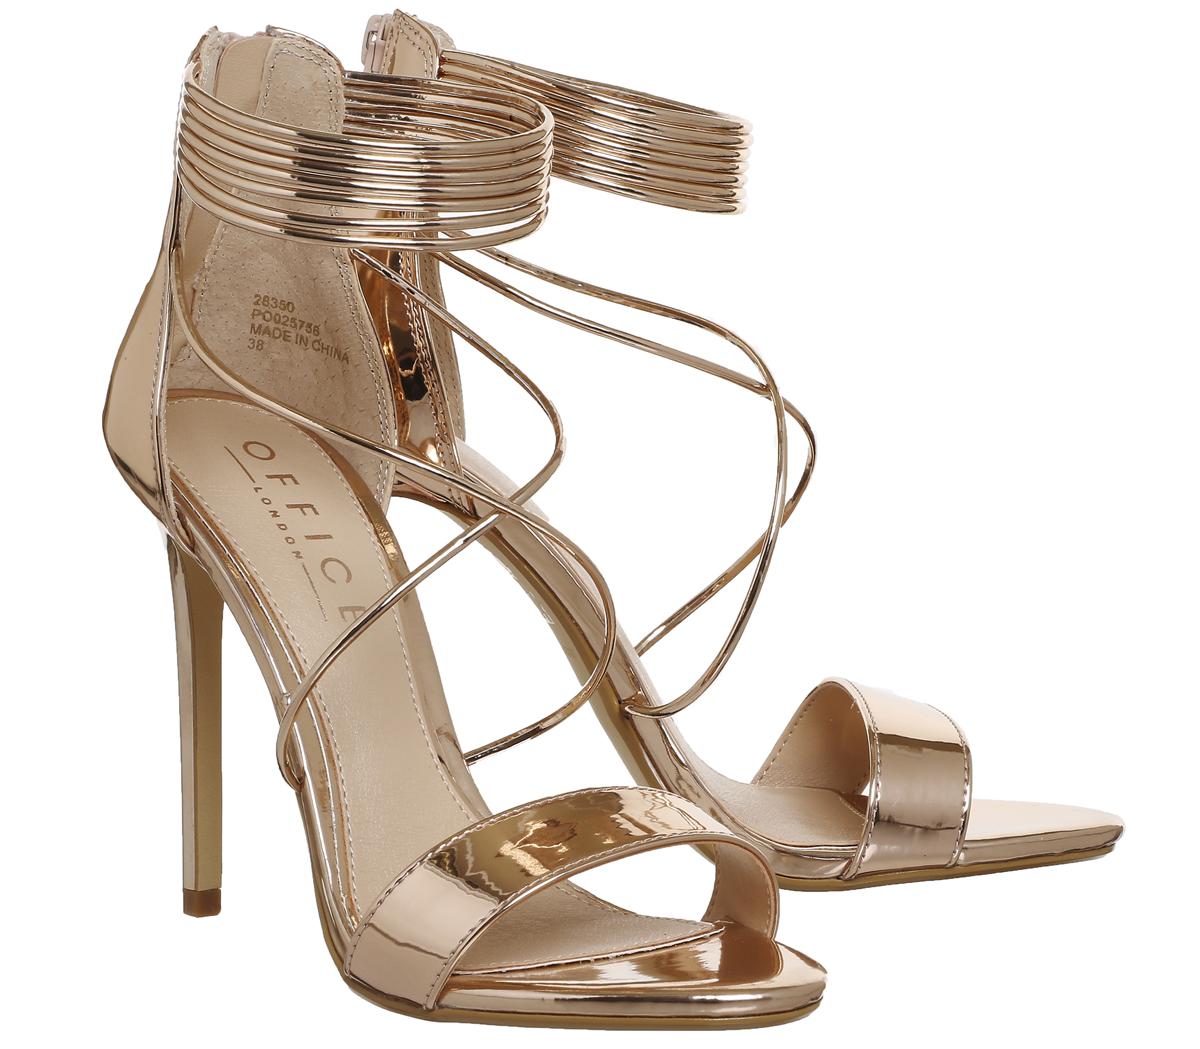 35ff9cea72 Office Hollywood Tubular Strap Sandals Rose Gold Mirror - Amaliah